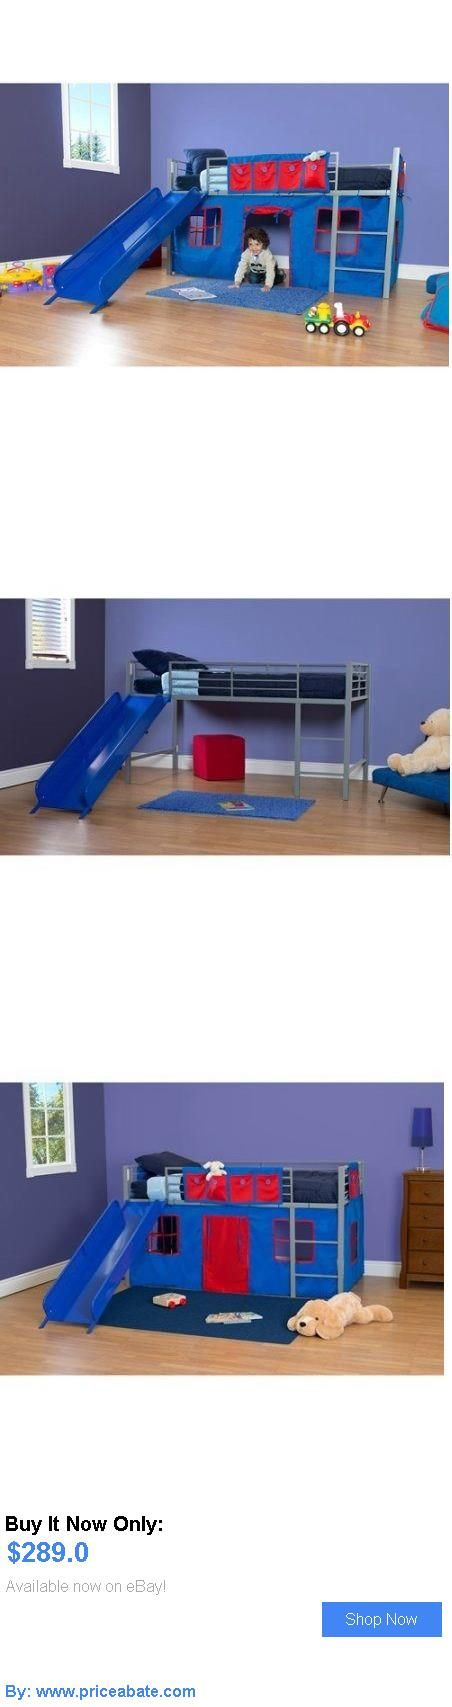 Kids At Home: Boys Twin Size Loft Bed With Slide Kids Children Bedroom  Furniture Blue. Etagenbetten ...